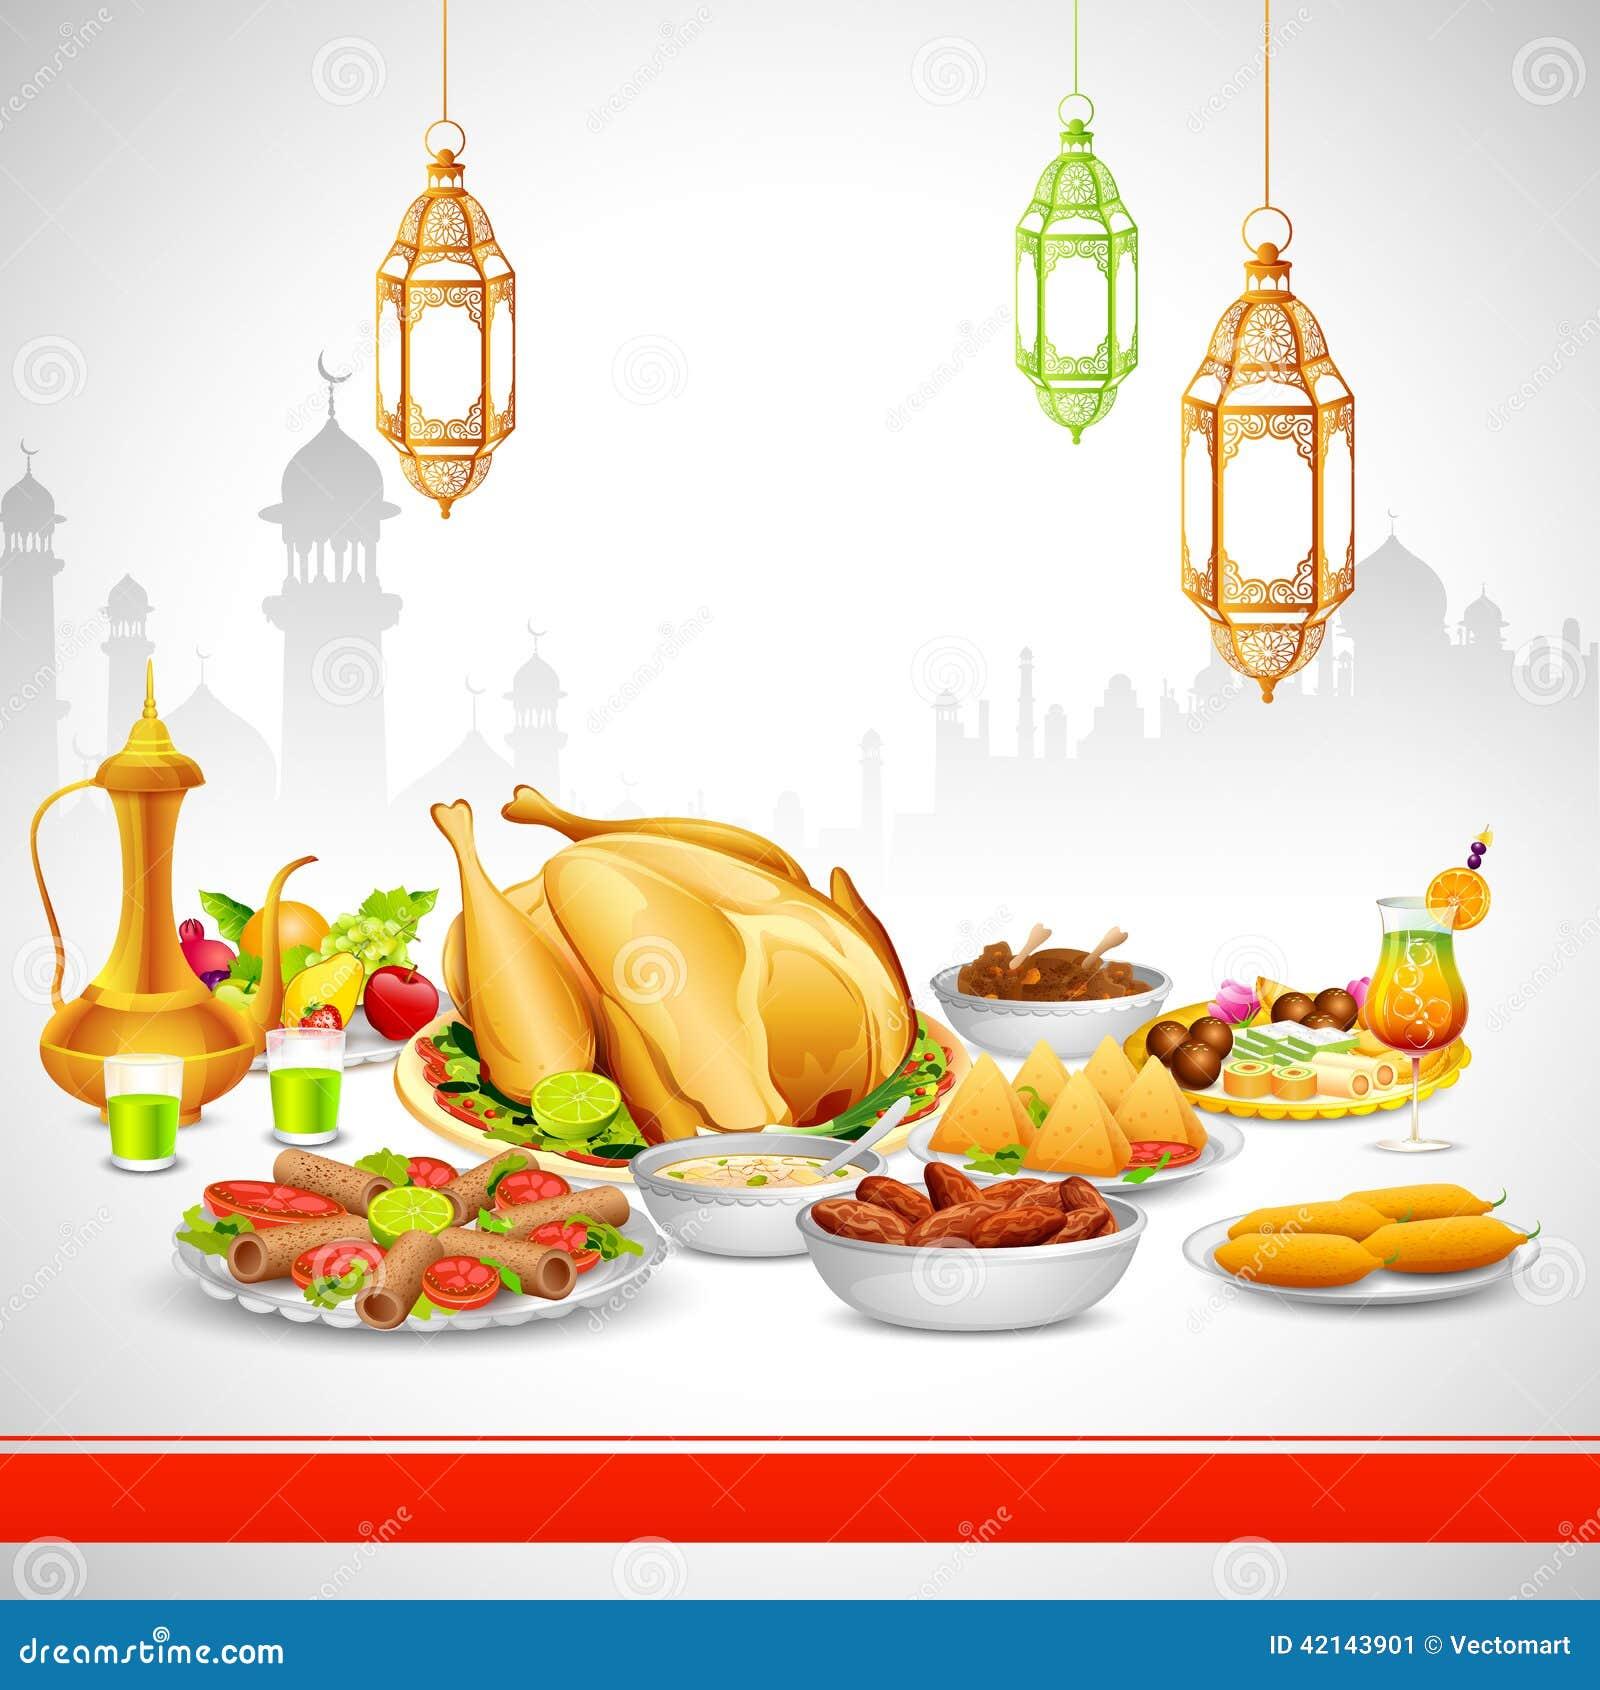 Diwali wallpaper 3d